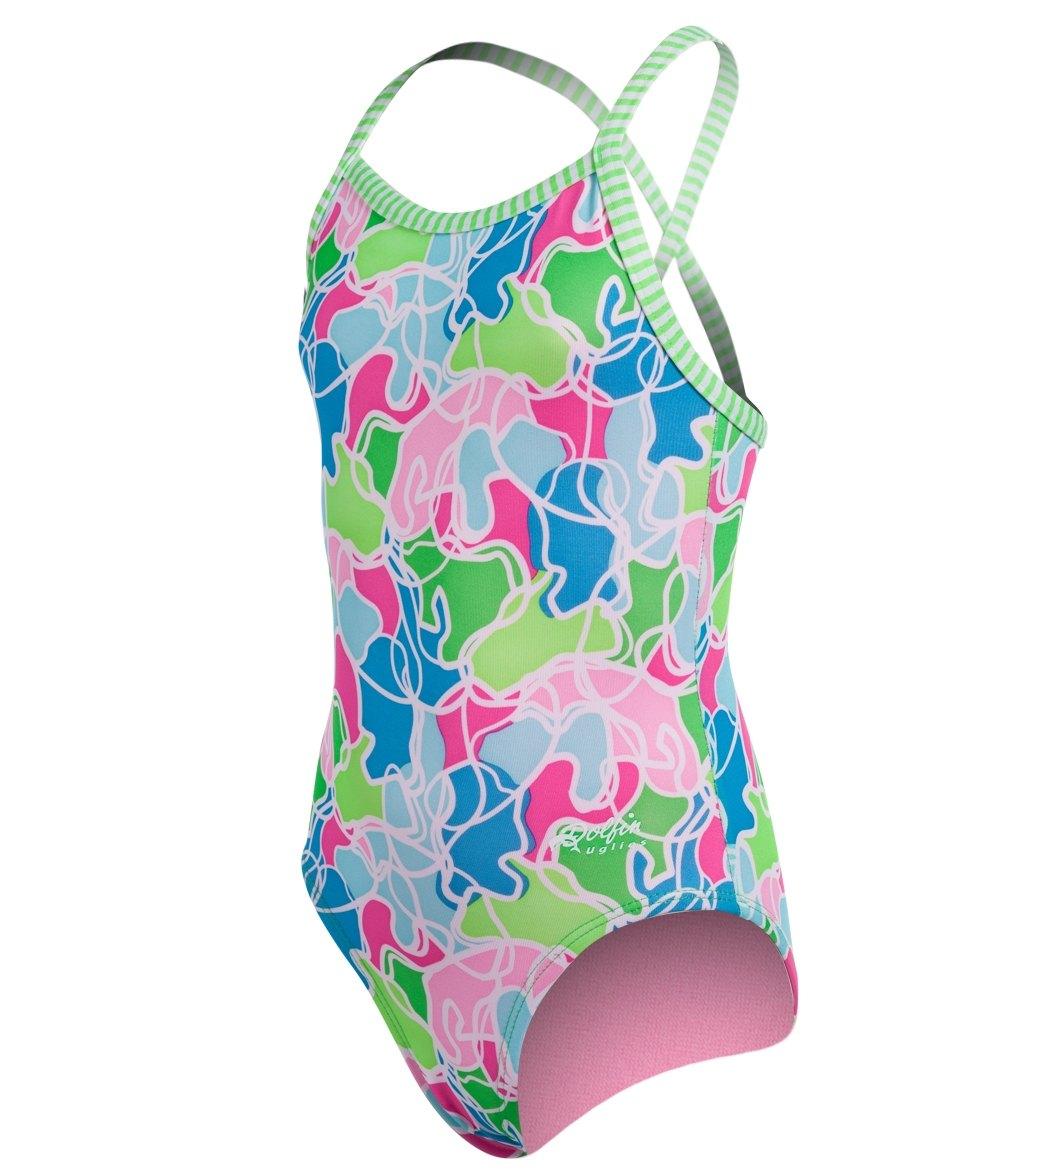 53506fe259df8 Dolfin Little Dolfin Uglies Gidget Toddlers One Piece Swimsuit (2T-6X ...